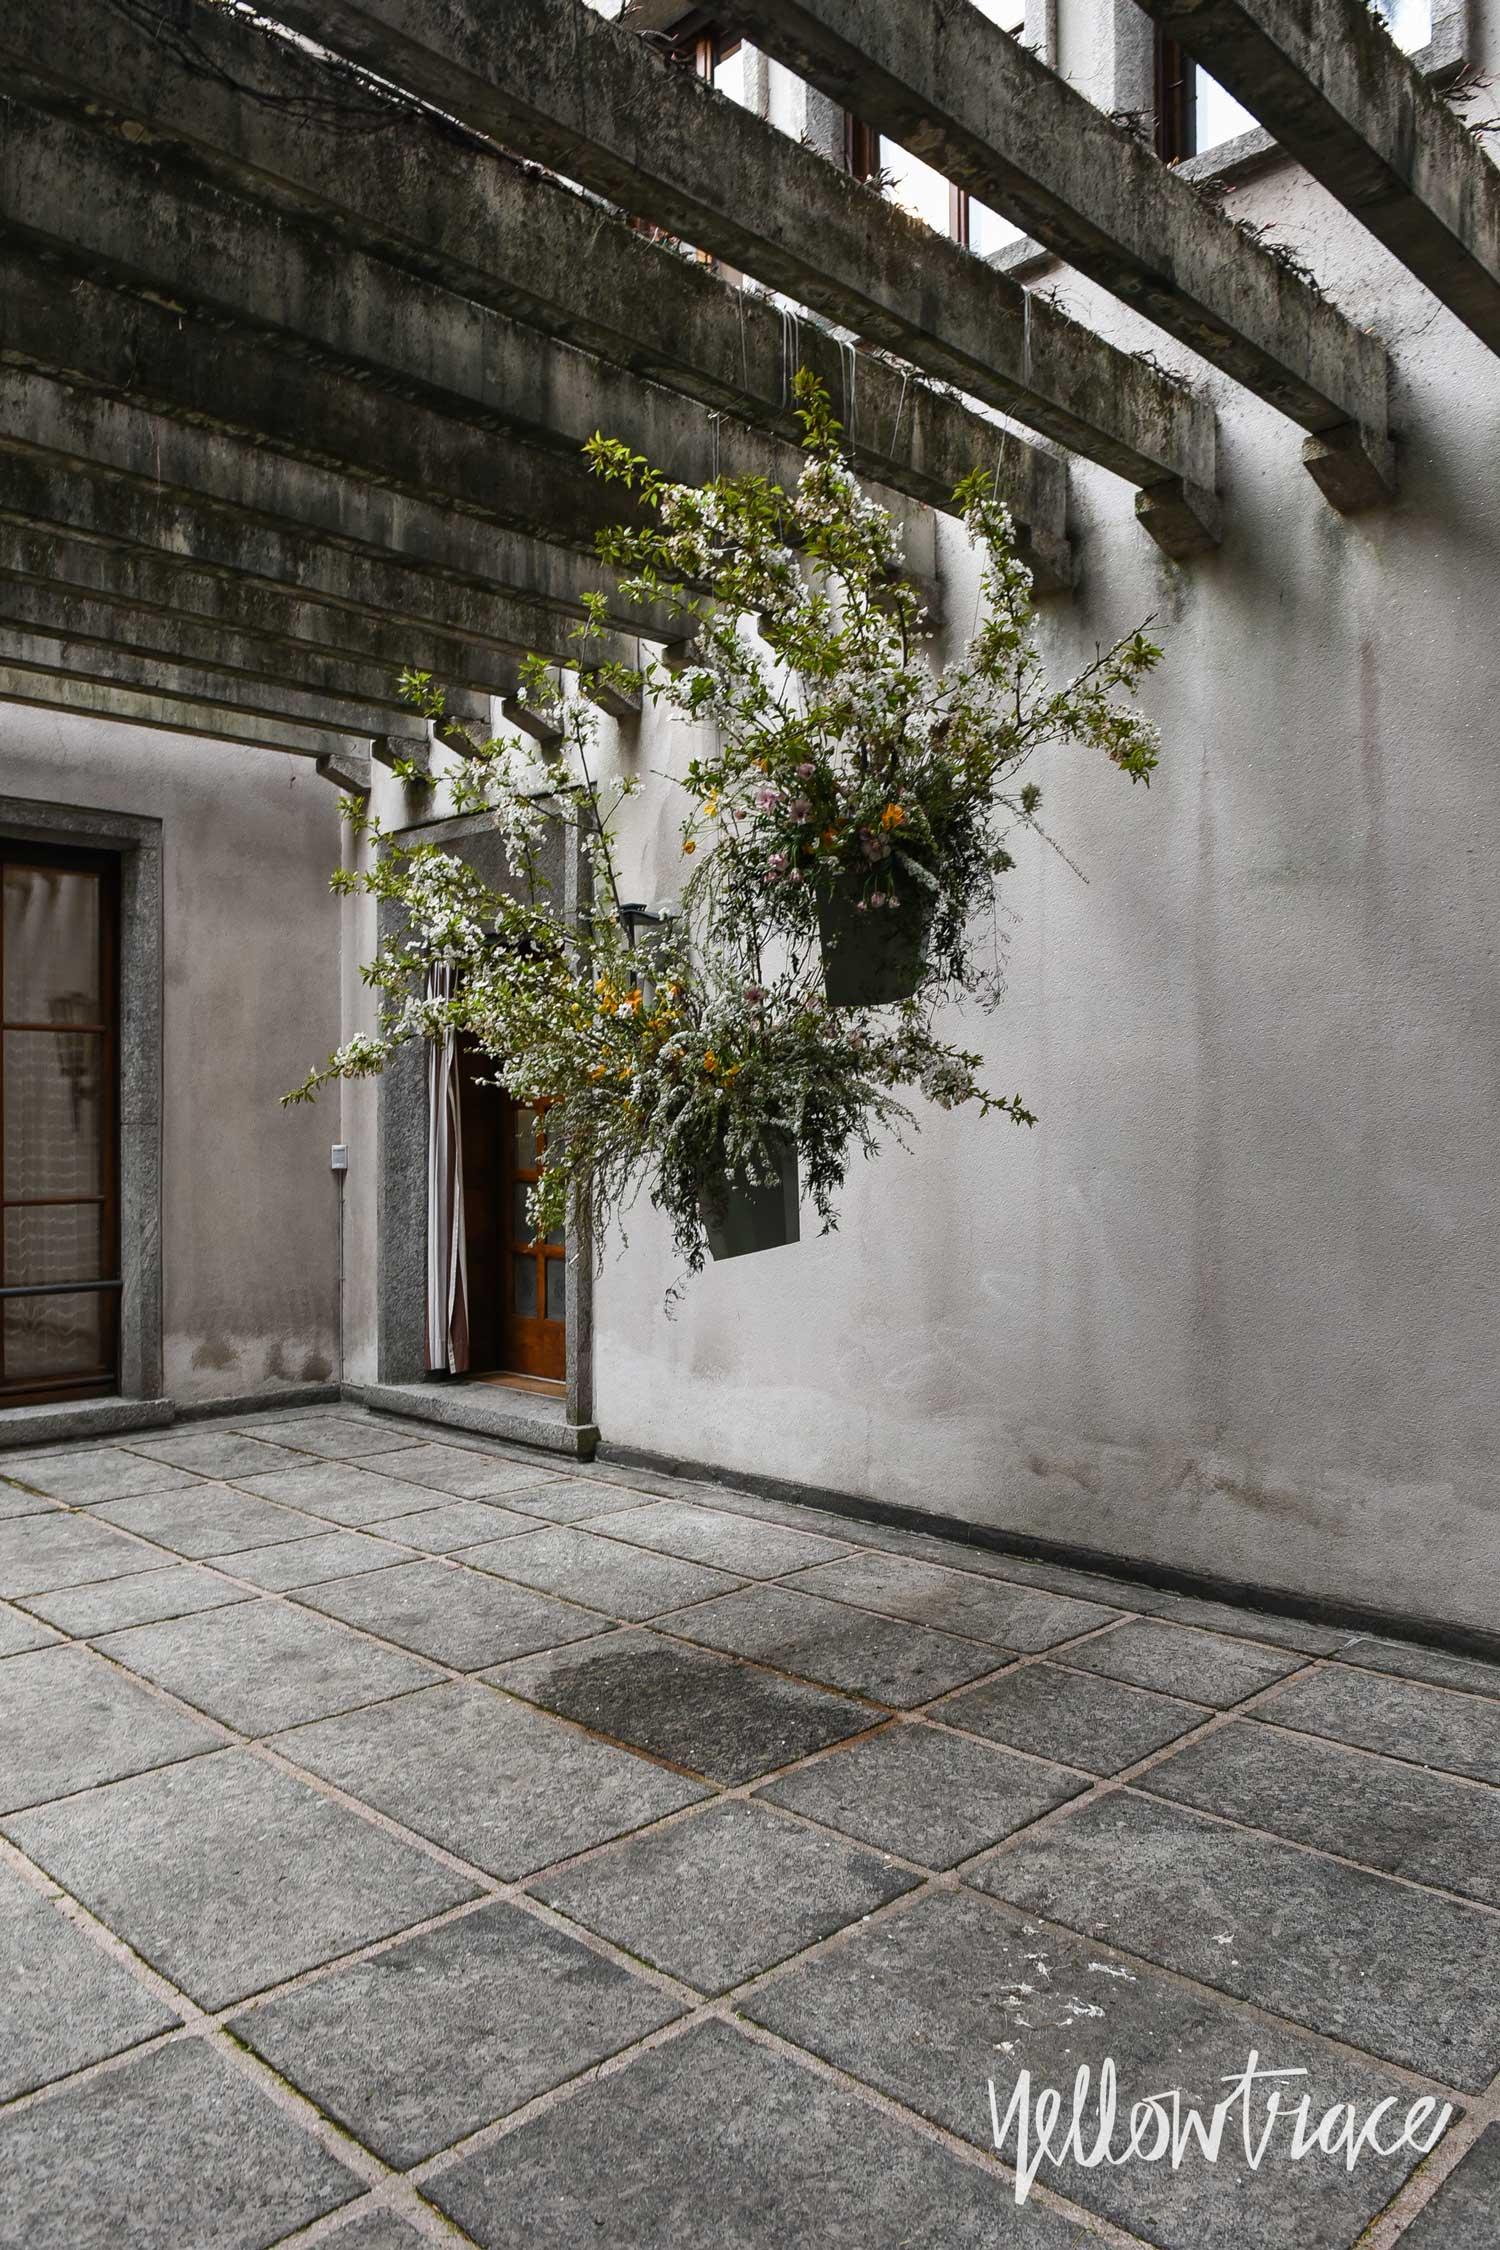 Villa Borsani: Osvaldo Borsani's 1943 Jewel in Veredo, Italy. Photo by Nick Hughes | #Milantrace2018